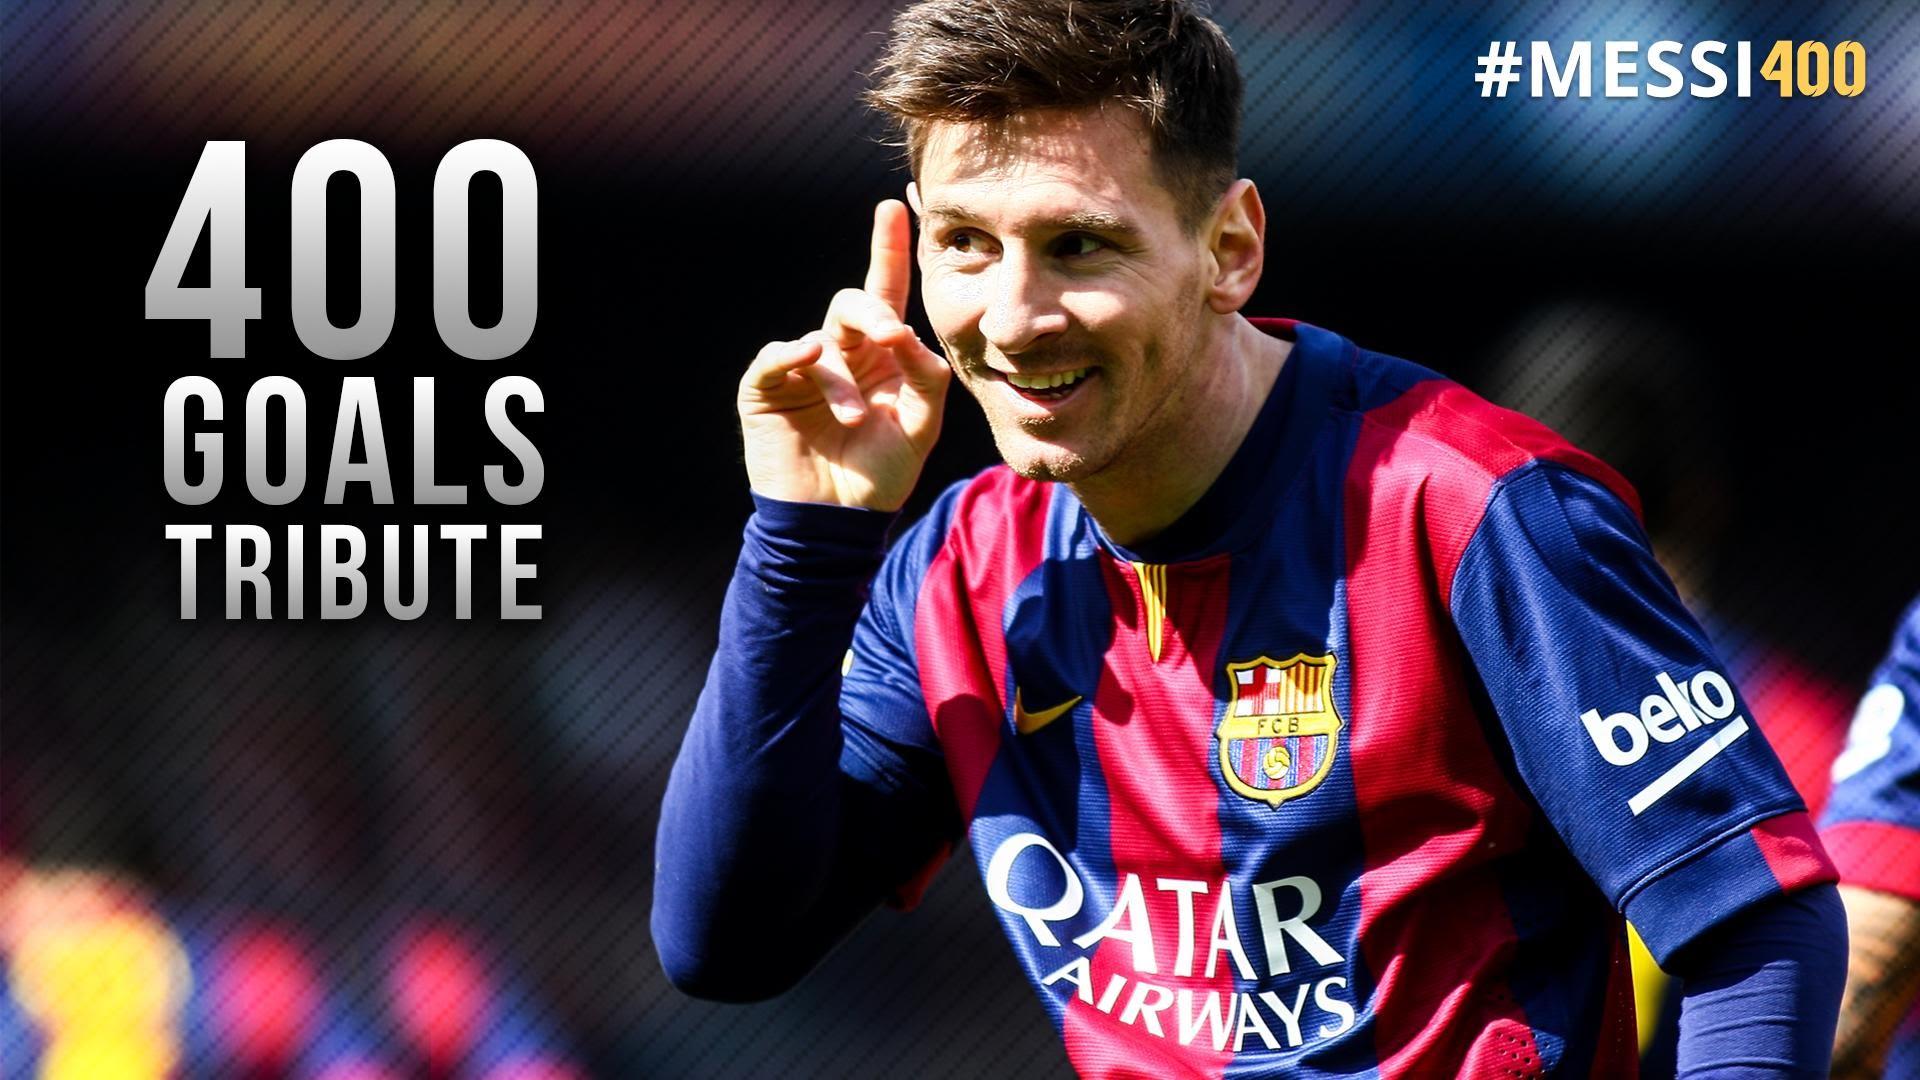 دانلود کلیپ تمام 400 گل لئو مسی 2004-2015 کیفیت HD